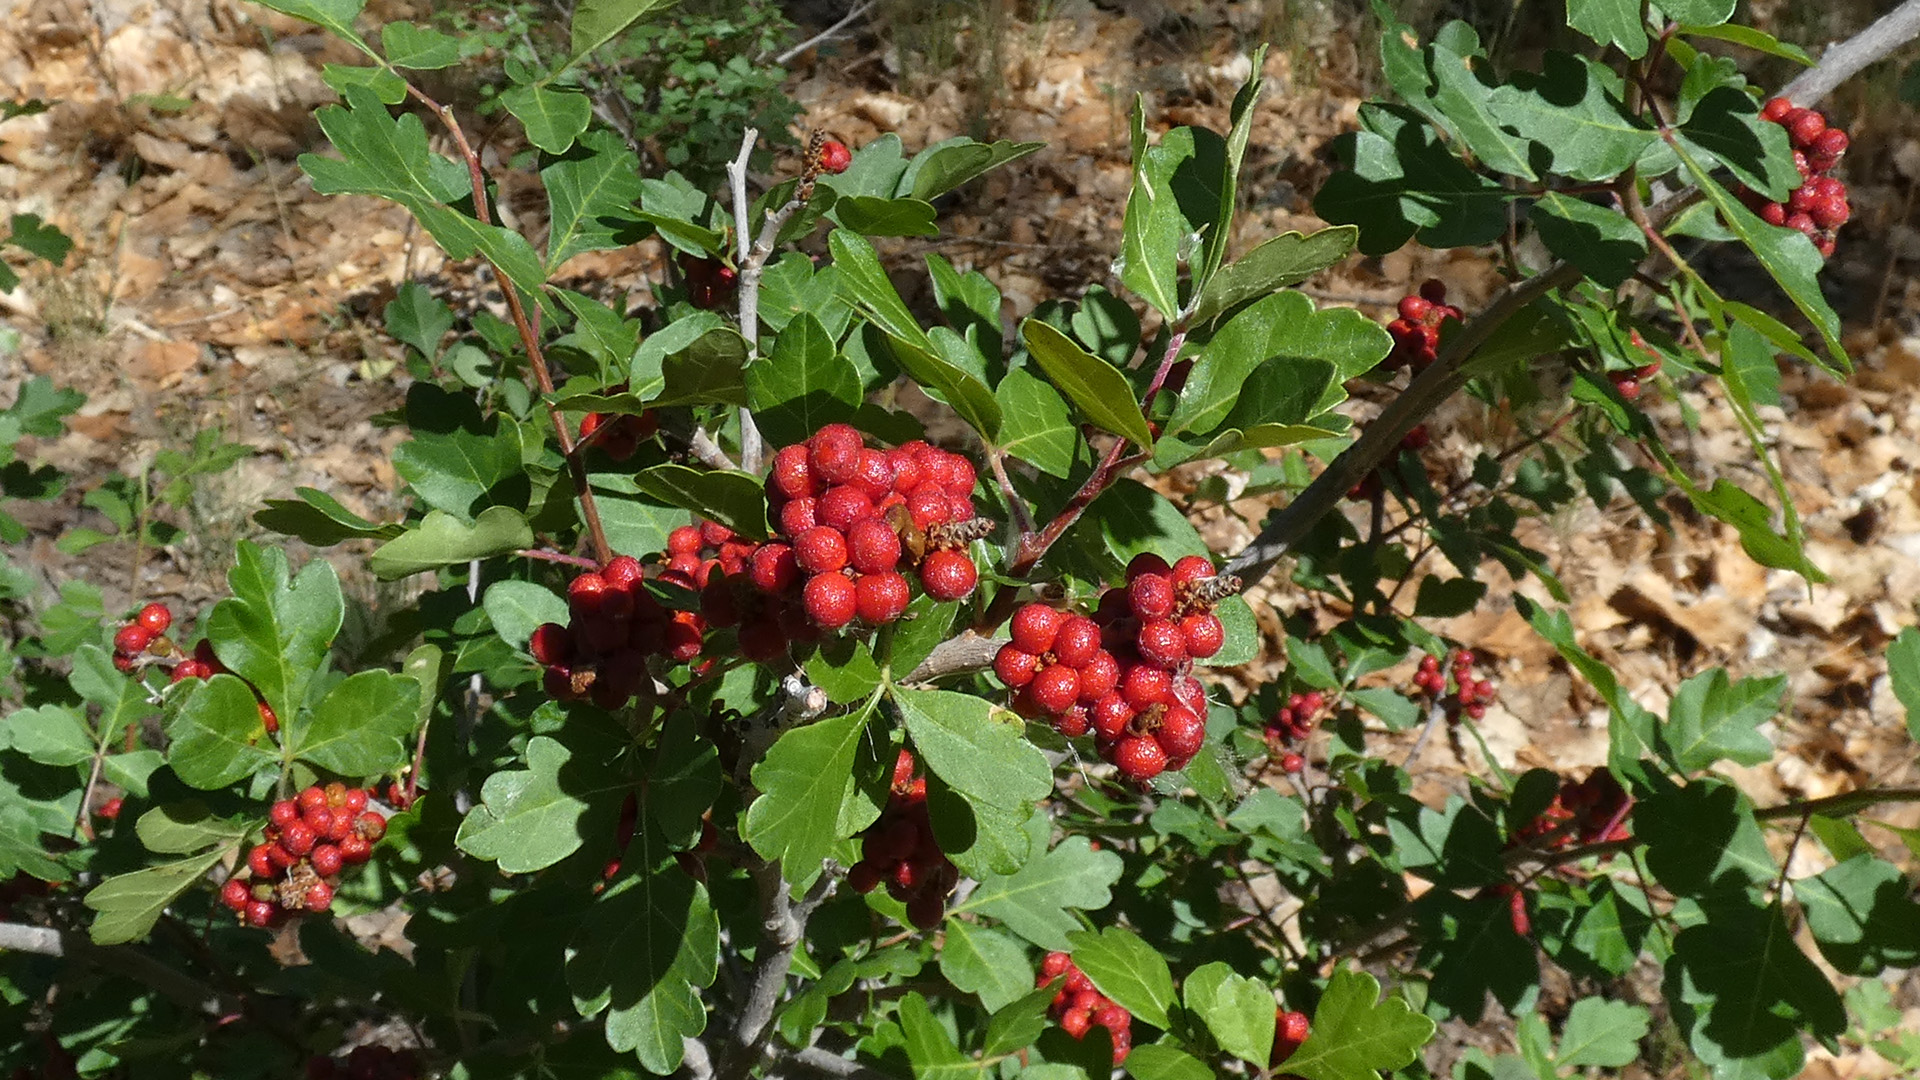 Ripe berries, Rio Grande Bosque, Albuquerque, May 2020